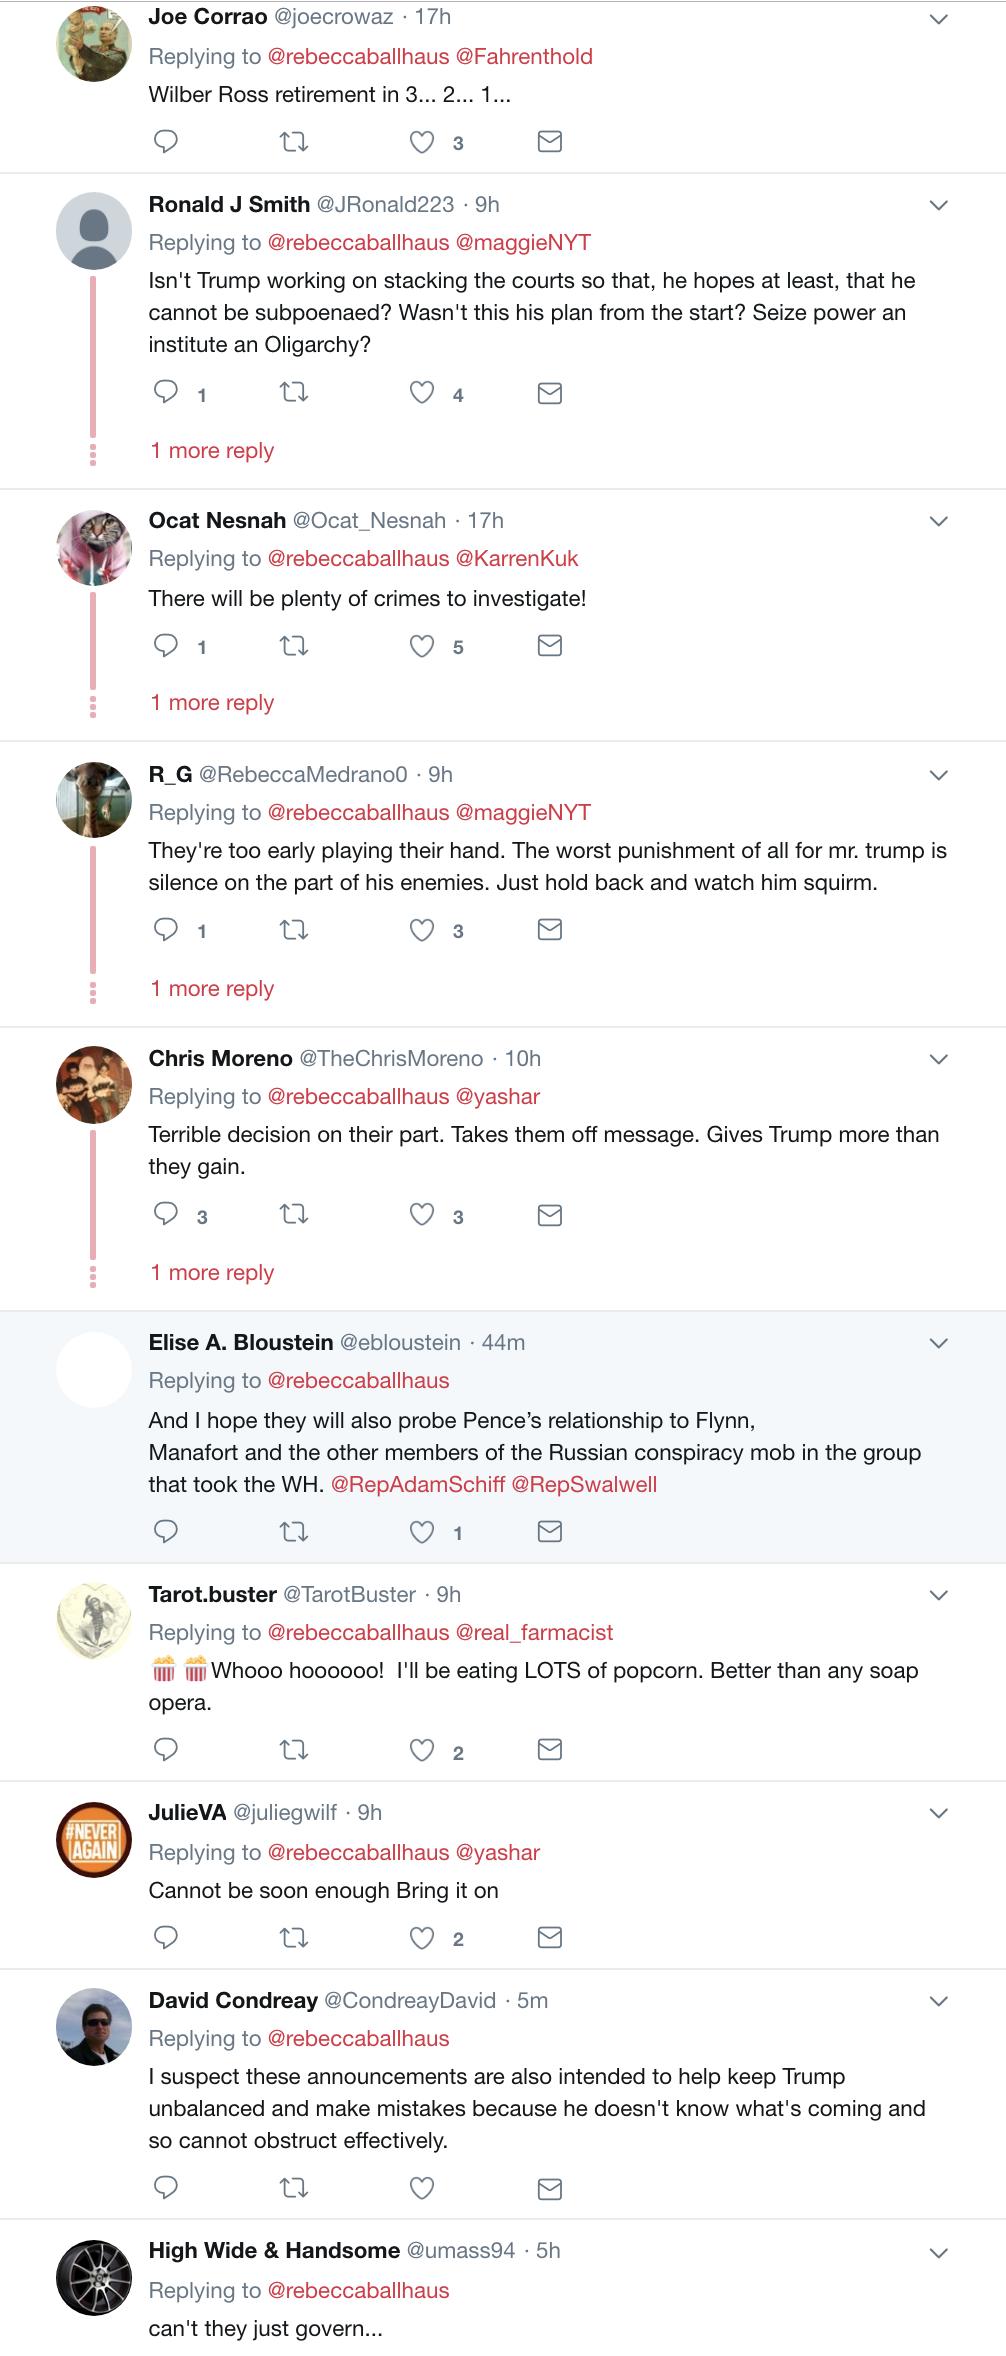 Screen-Shot-2018-11-12-at-8.12.01-AM Democrats Unveil 77 Subpoenas That Have Republicans Shook (DETAILS) Corruption Crime Donald Trump Mueller Russia Top Stories